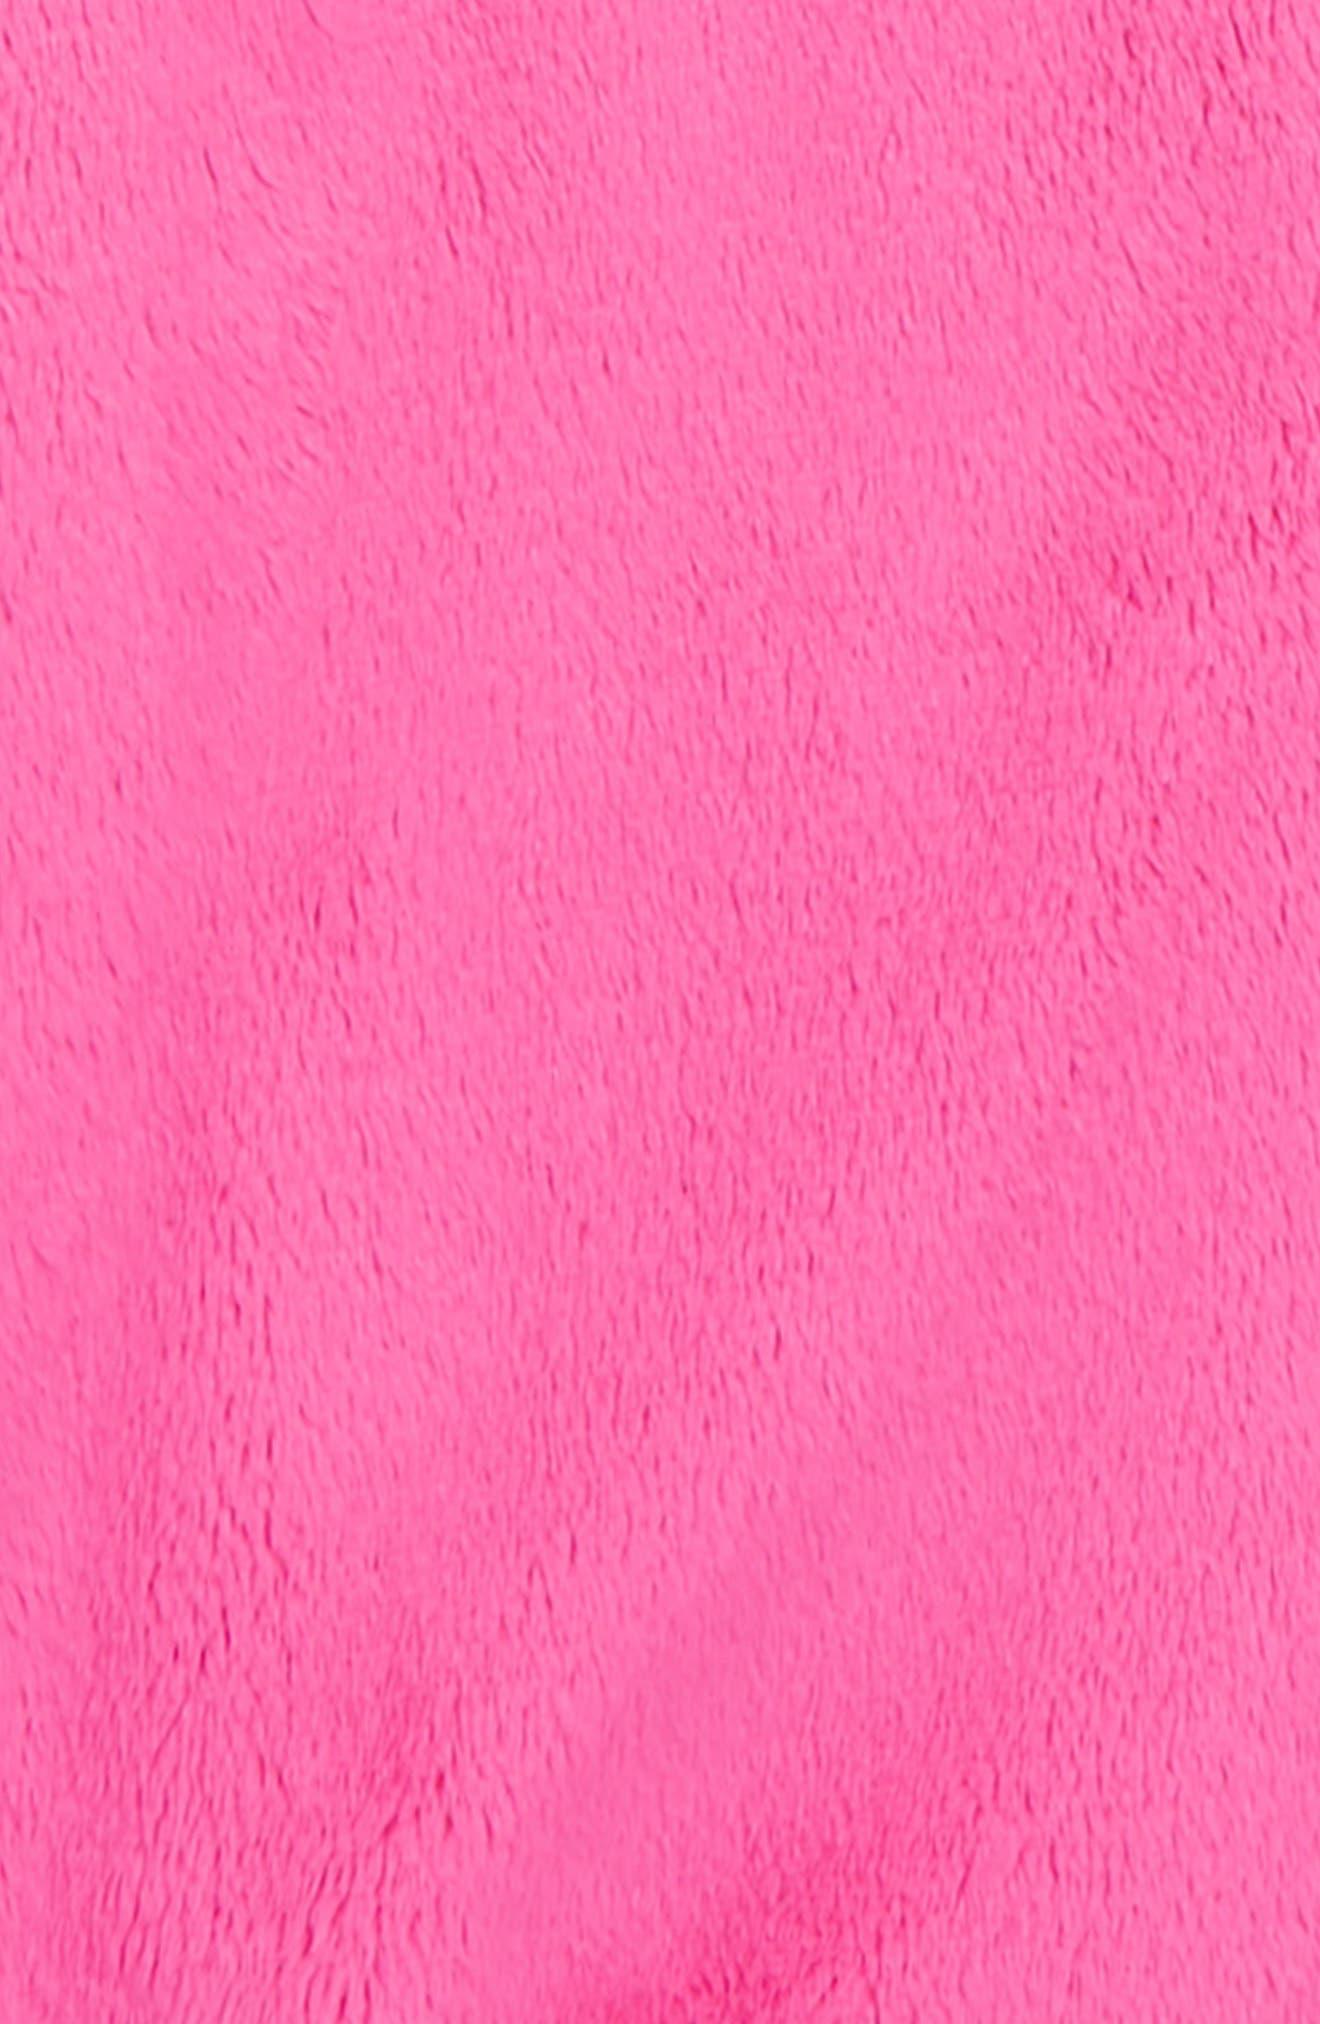 OSO Fleece Full-Zip Hoodie,                             Alternate thumbnail 2, color,                             AZALEA PINK